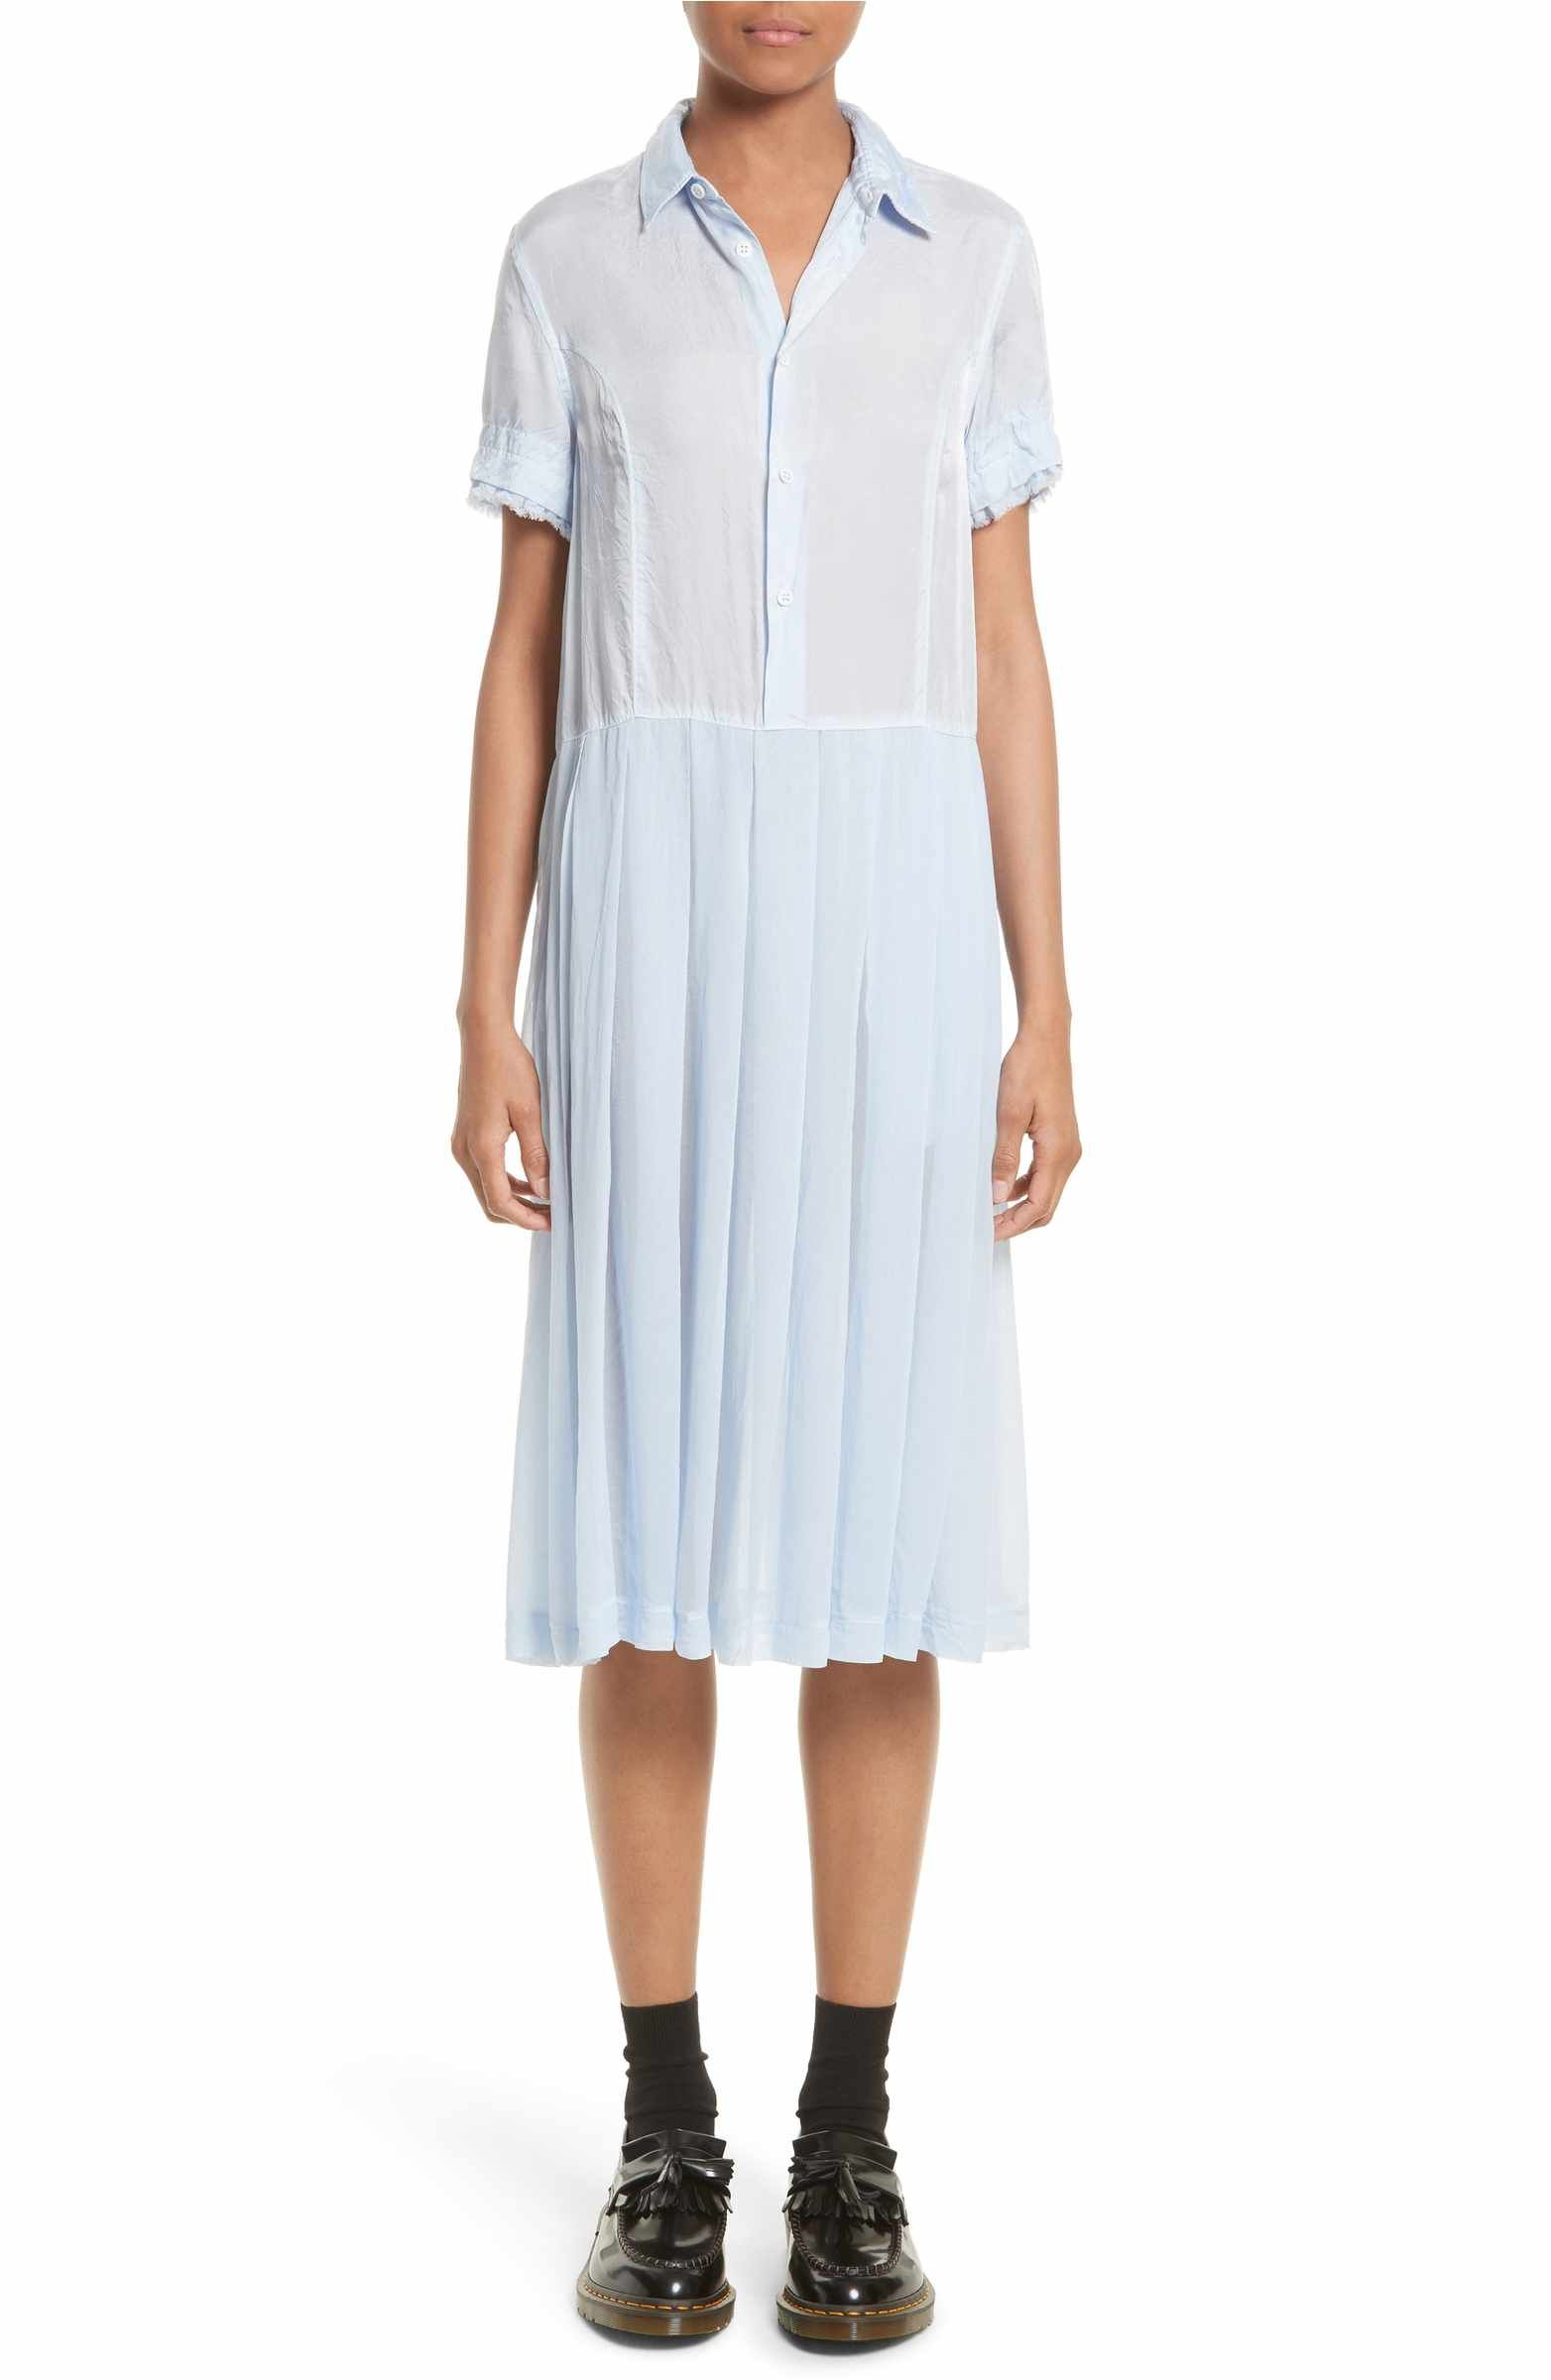 6aed47b7864e Main Image - Tricot Comme des Garçons Shirtdress | clothes | Shirt ...